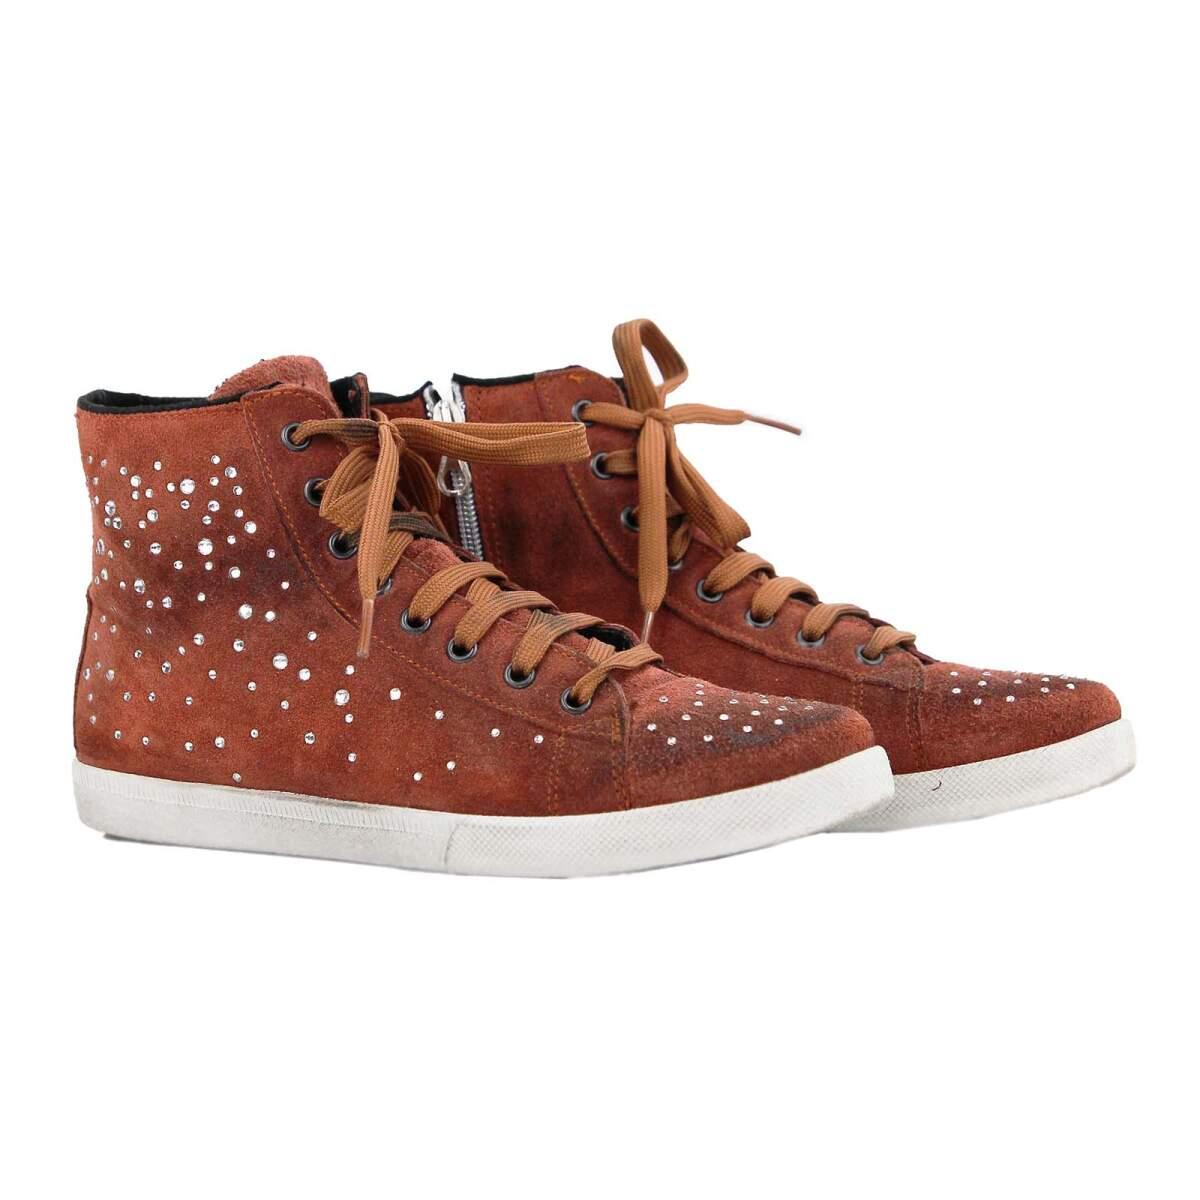 Ovye By Cristina Lucchi Echt Strasssteine Leder Sneaker Schuhe Damen edorCWxB